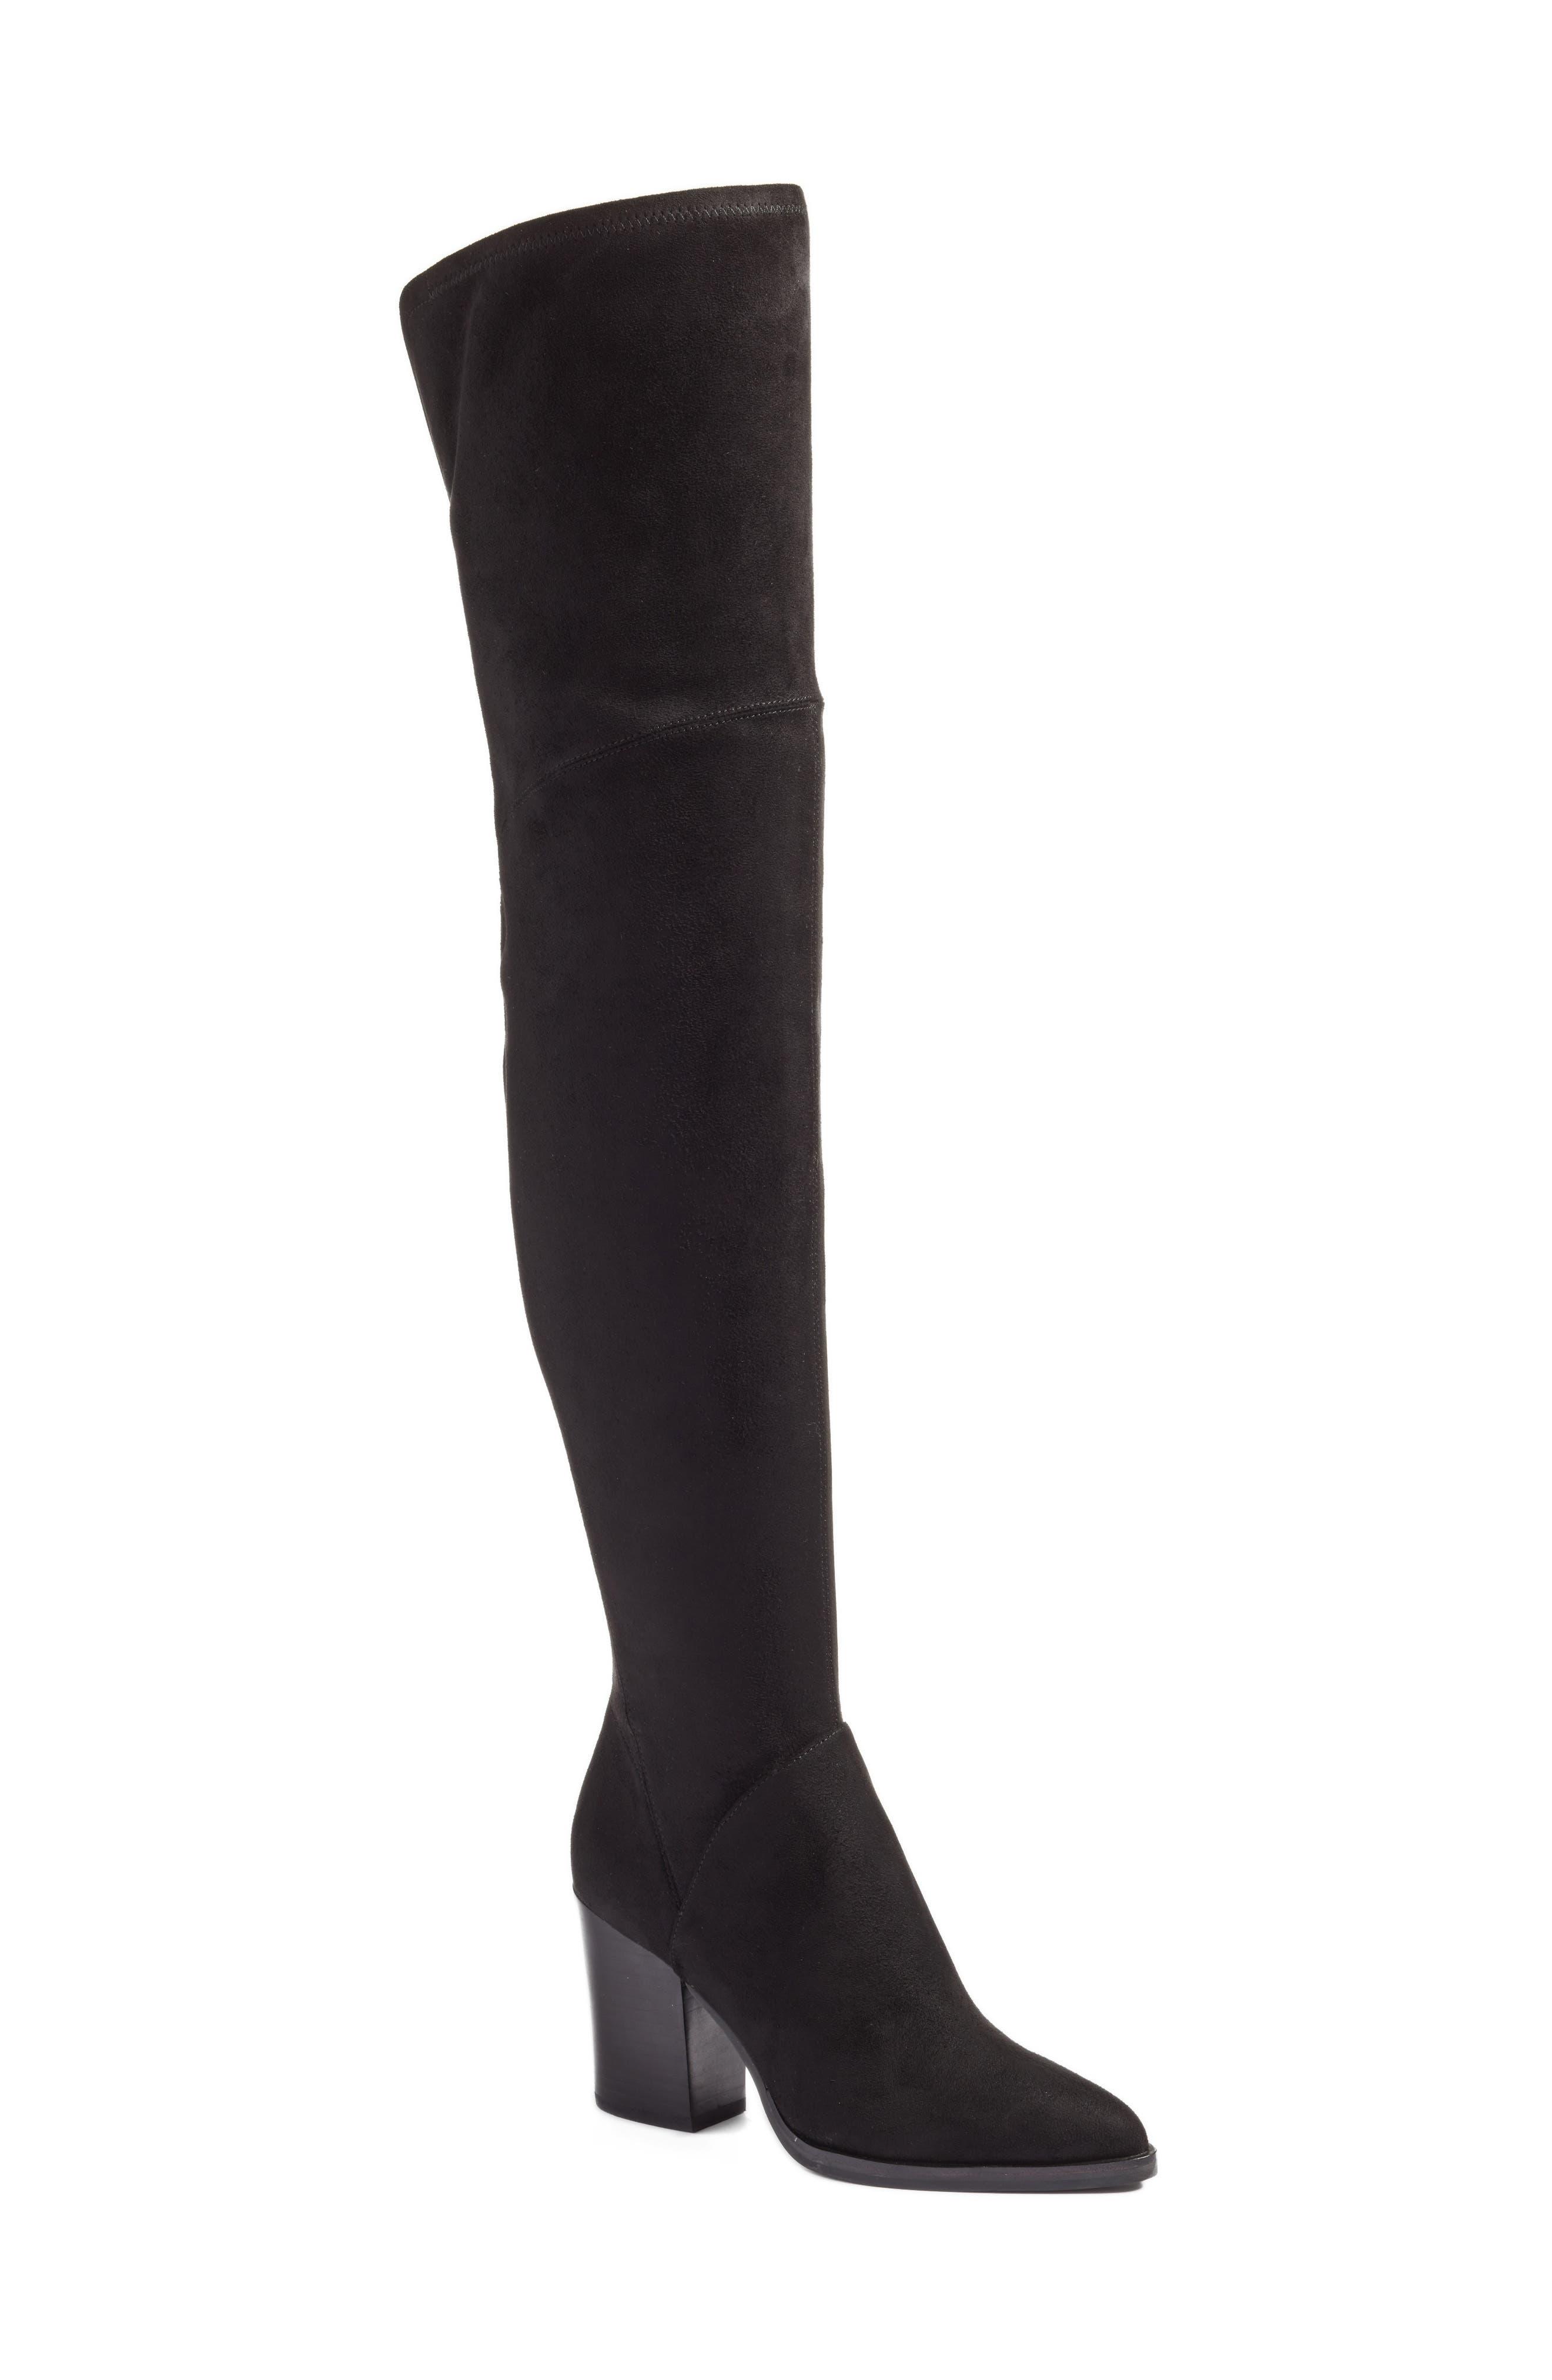 Alternate Image 1 Selected - Marc Fisher LTD Arrine Over the Knee Boot (Women)